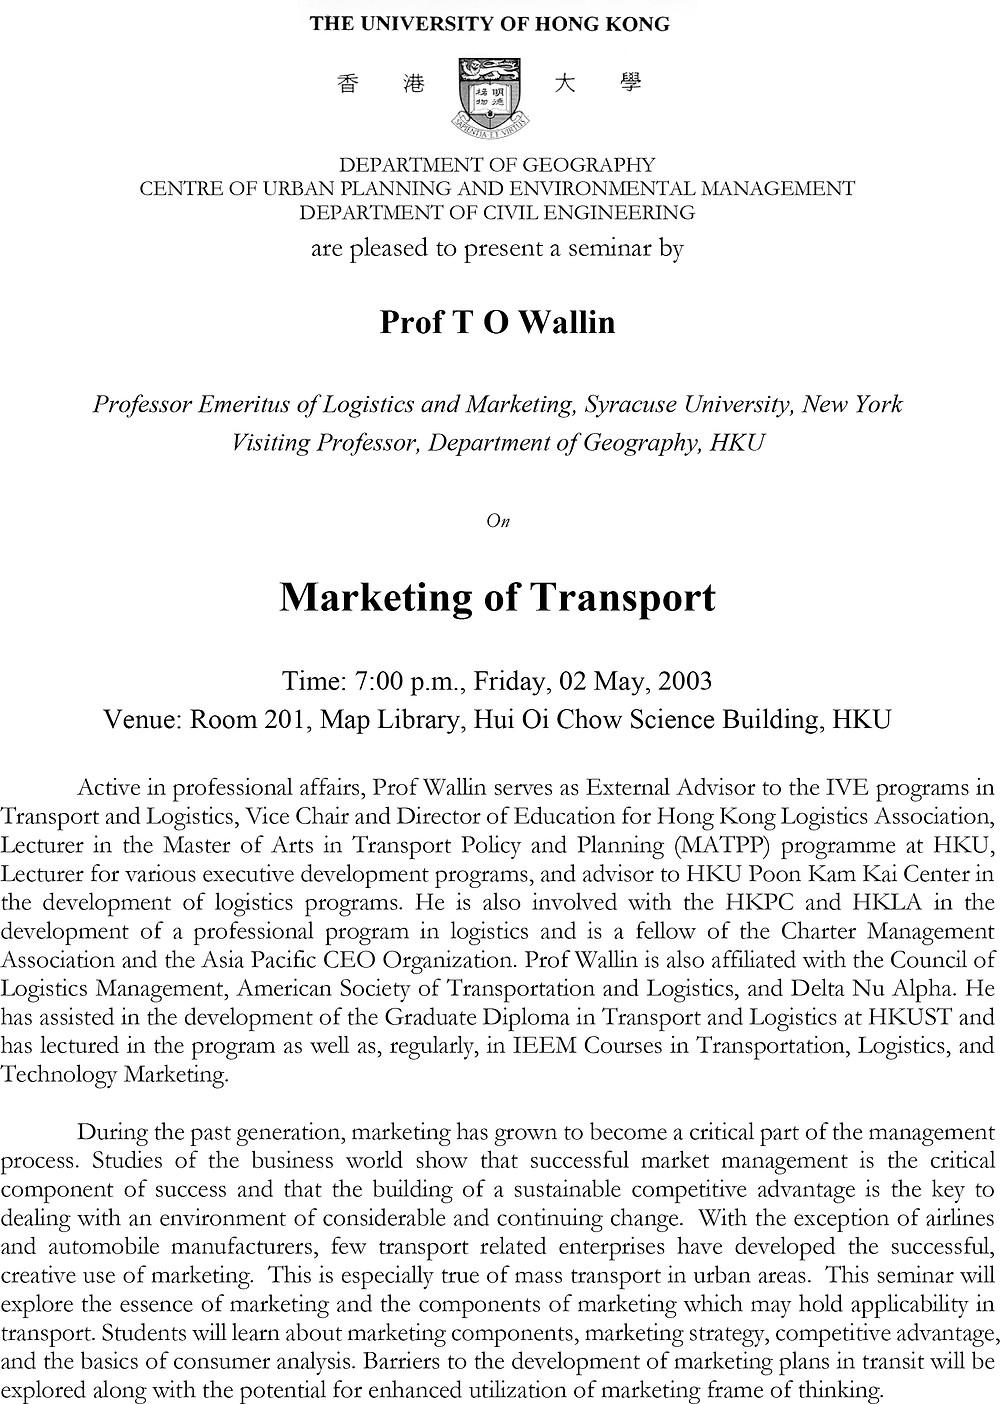 20030502 Seminar Poster